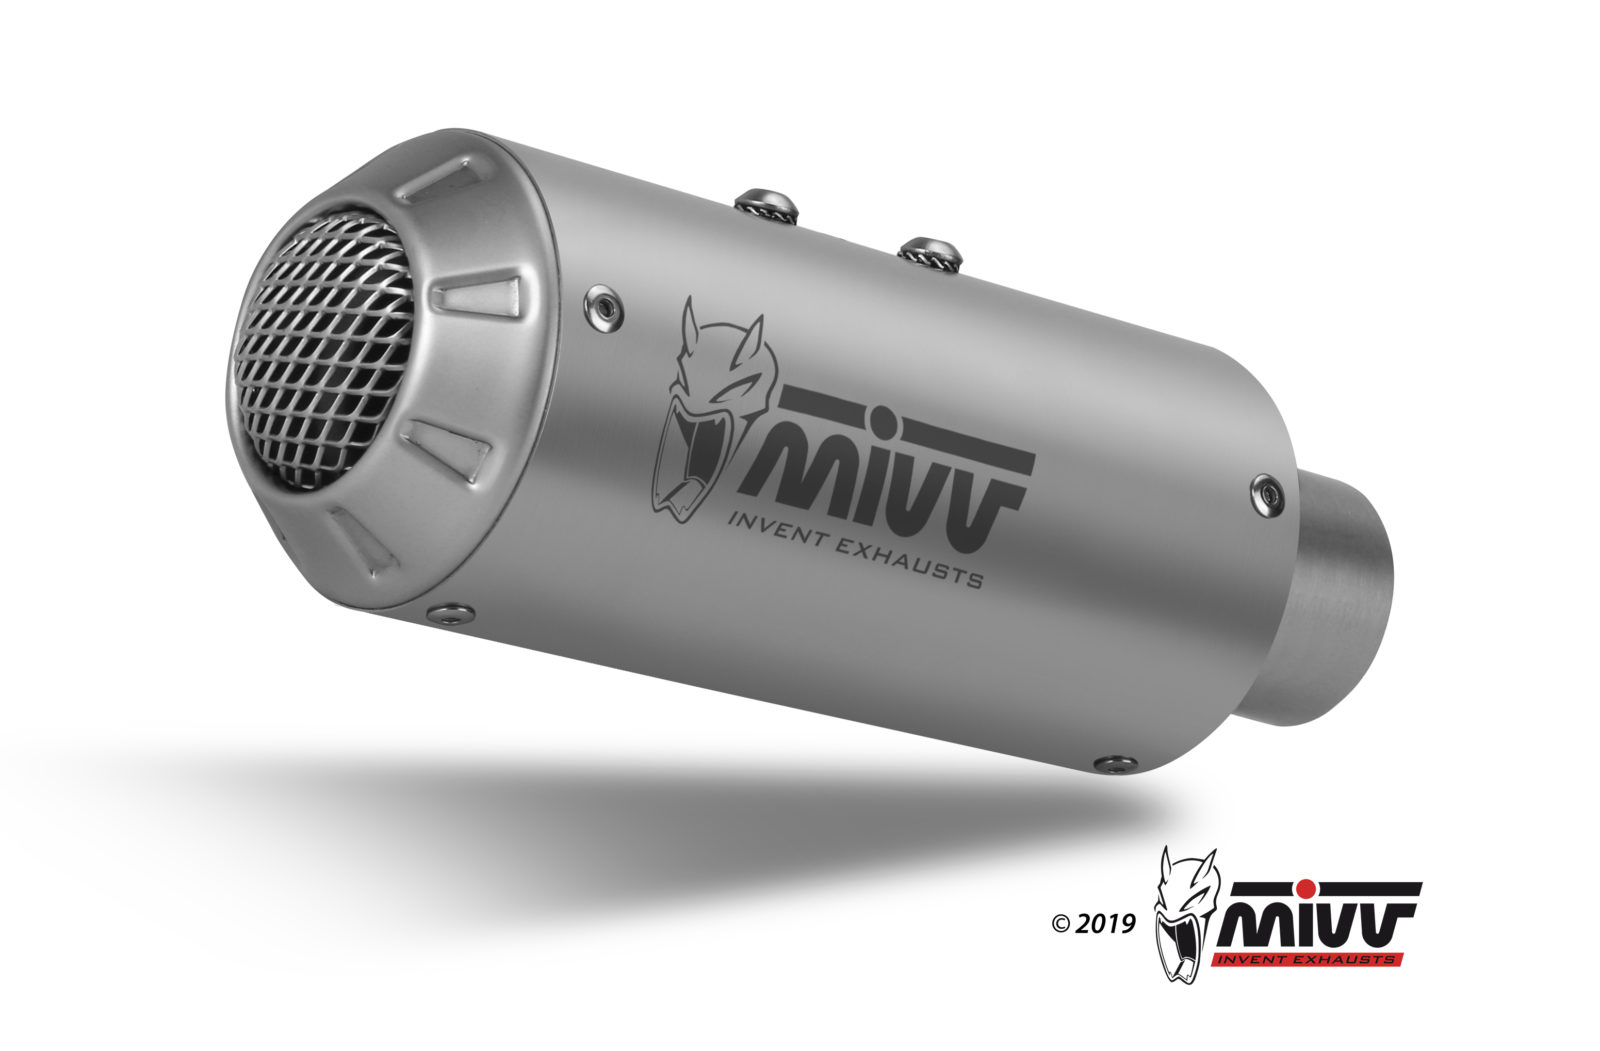 kawasaki ninja 650 exhaust mivv mk3